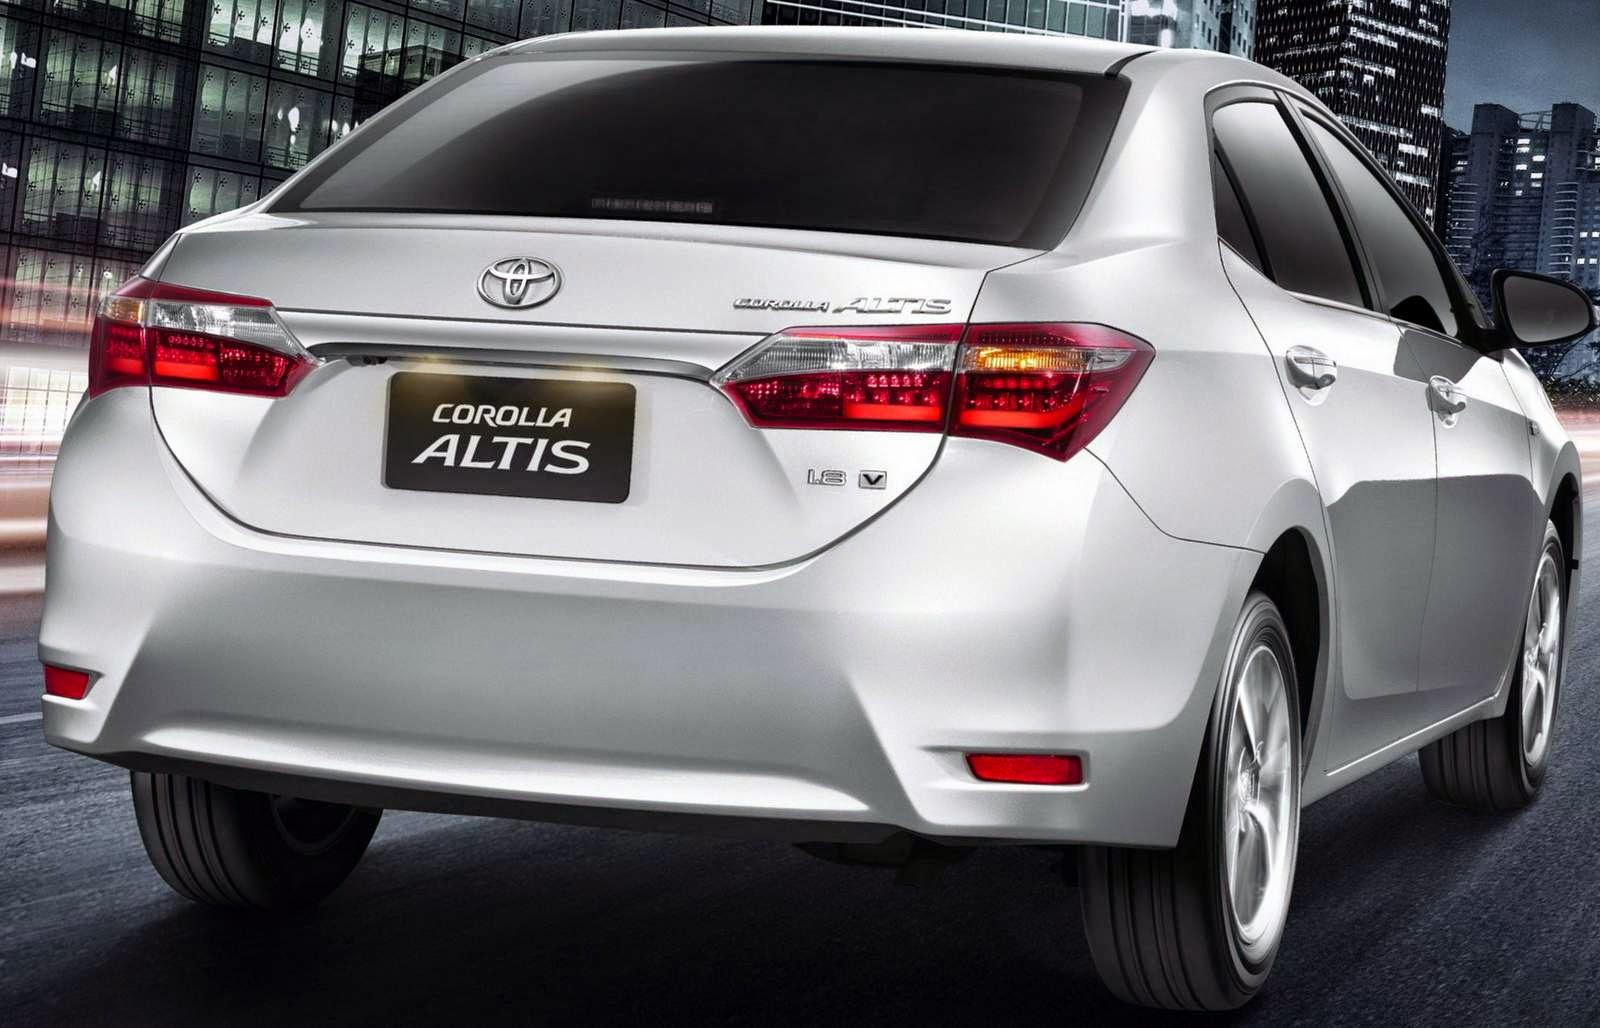 Novo Corolla 2015 fotos sedan altis automatico